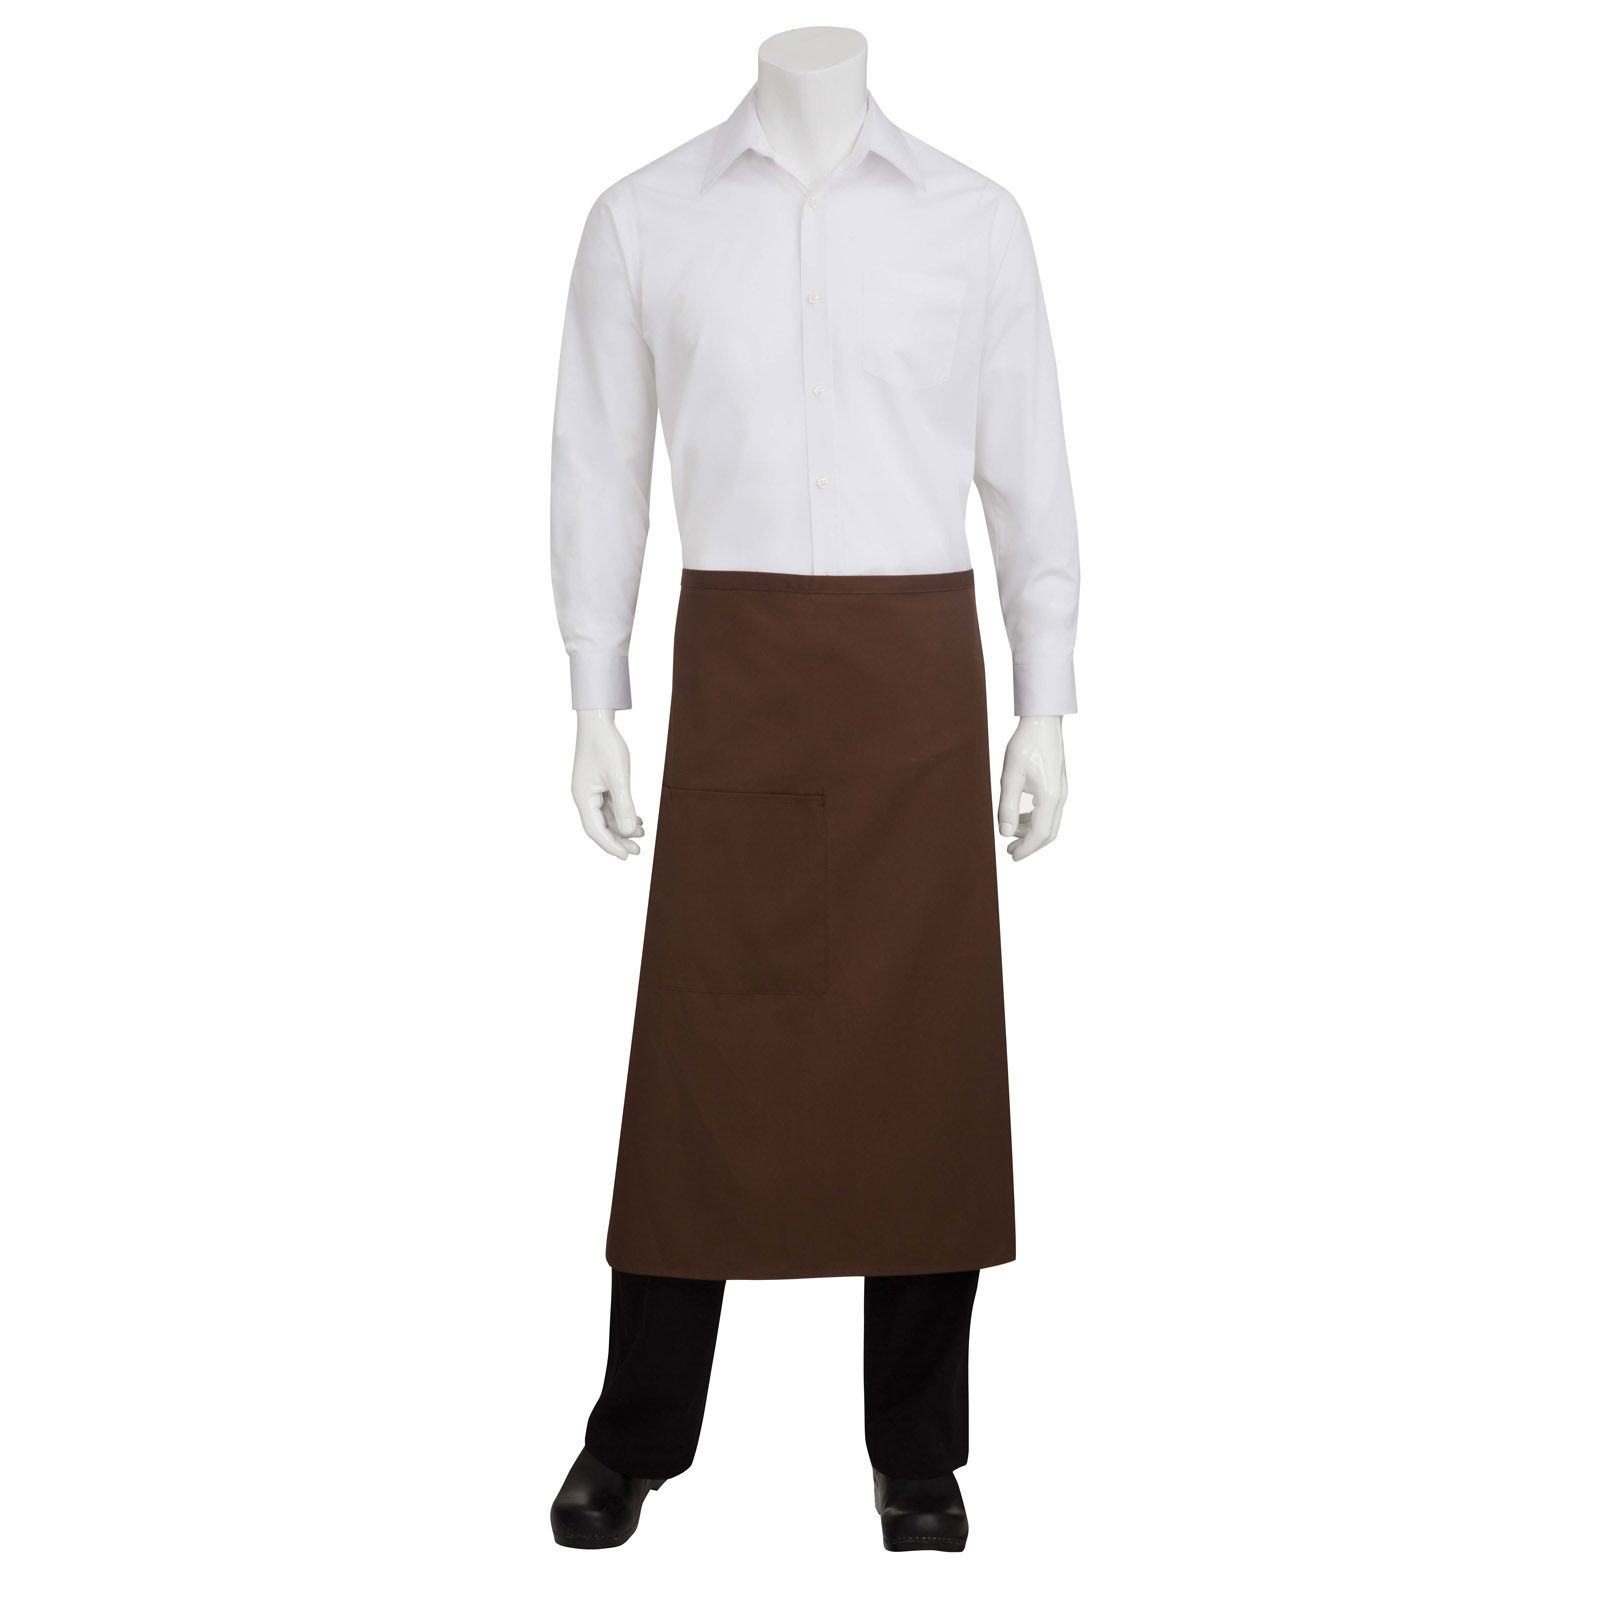 Chef Works F24 RUS0 waist apron